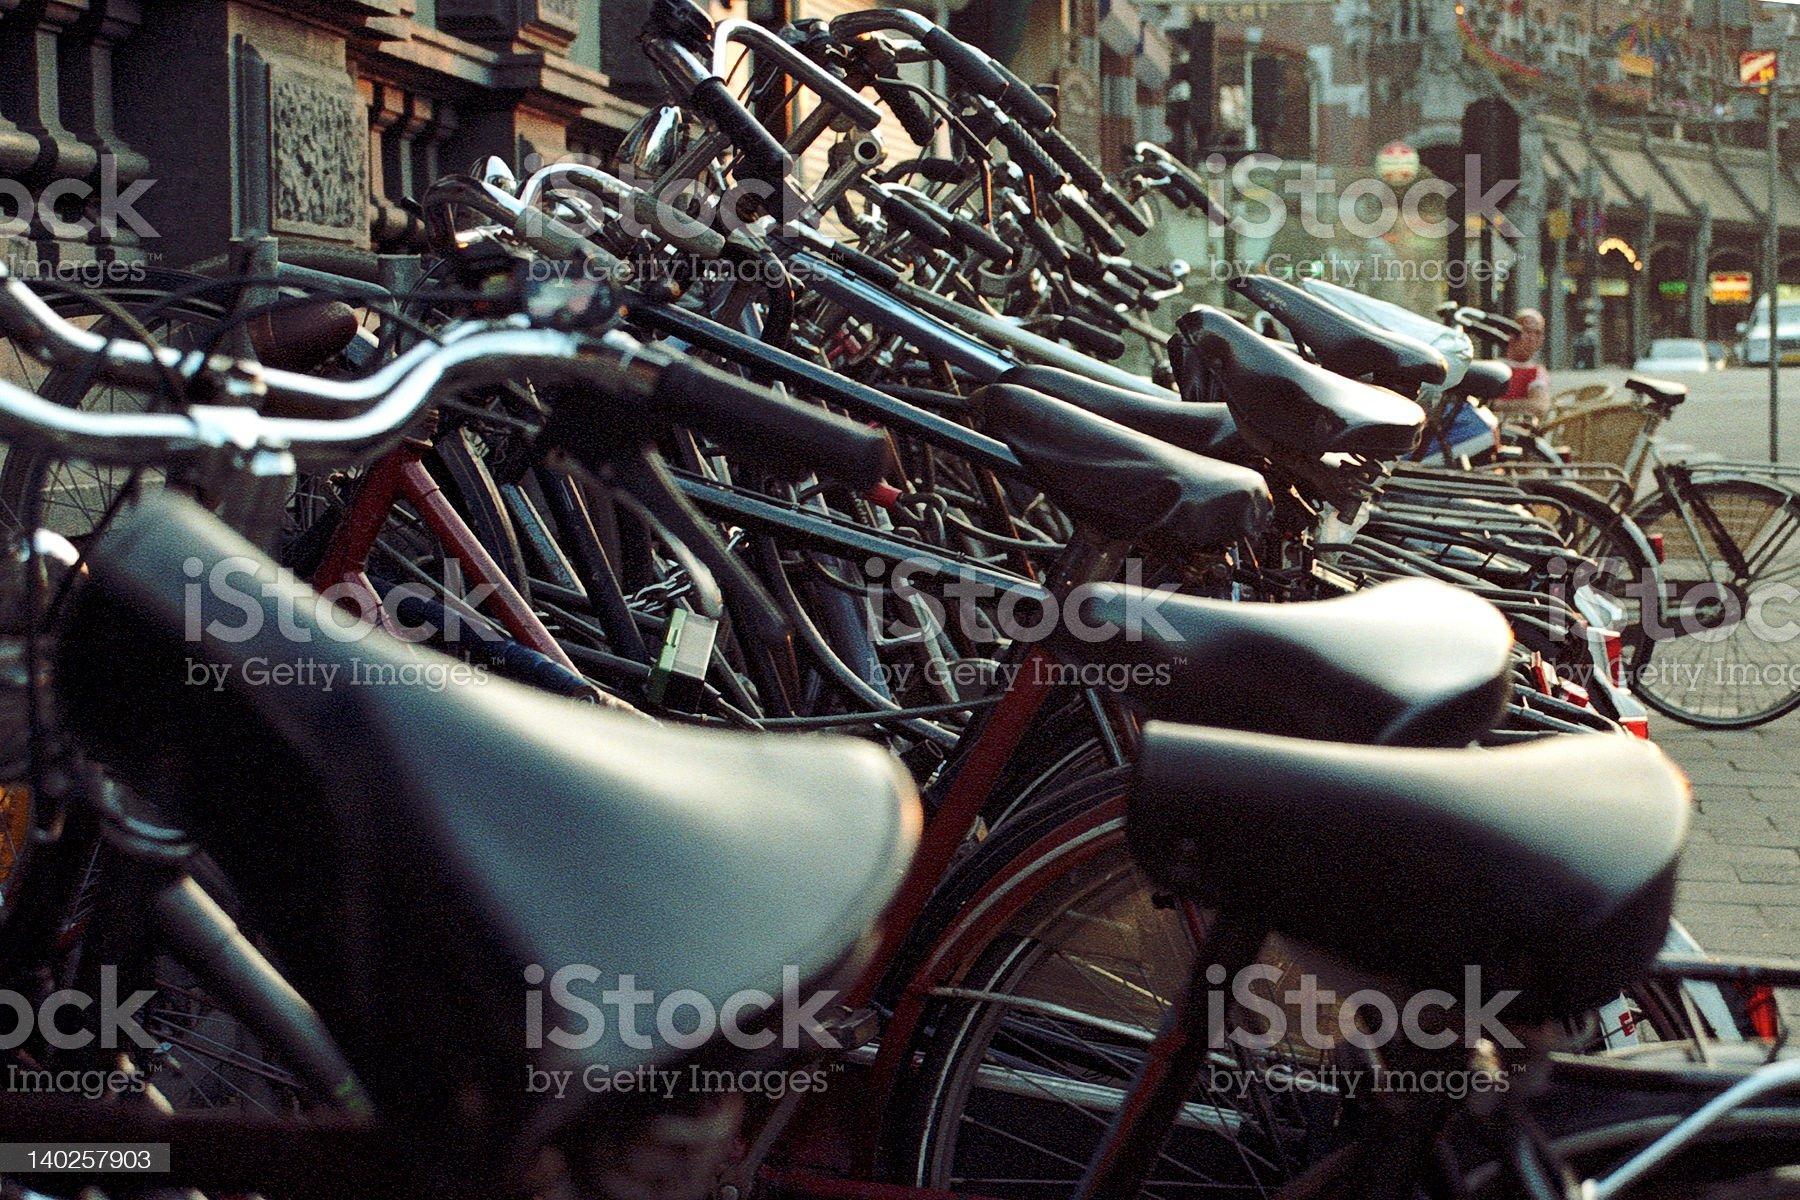 Bikes of Amsterdam royalty-free stock photo